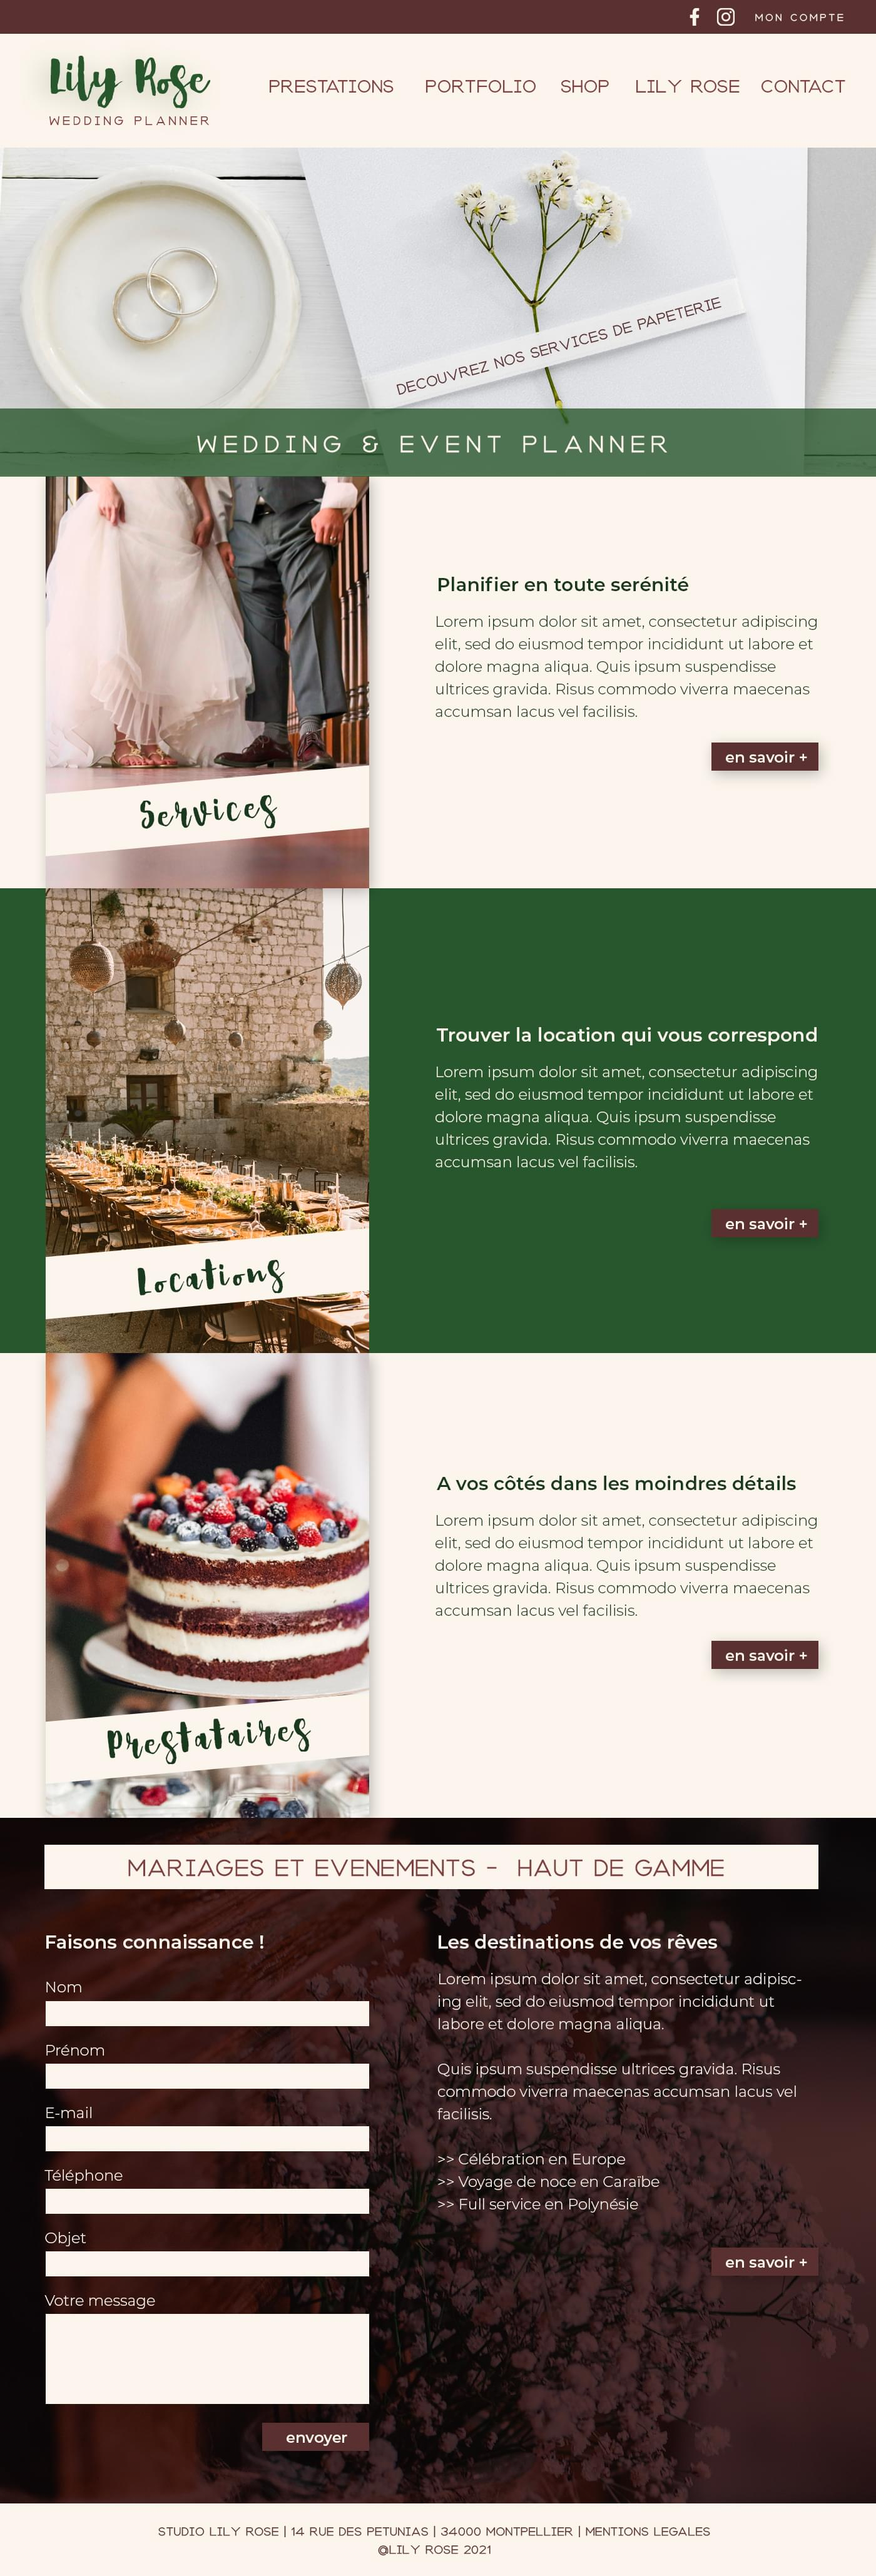 Maquette site web version1